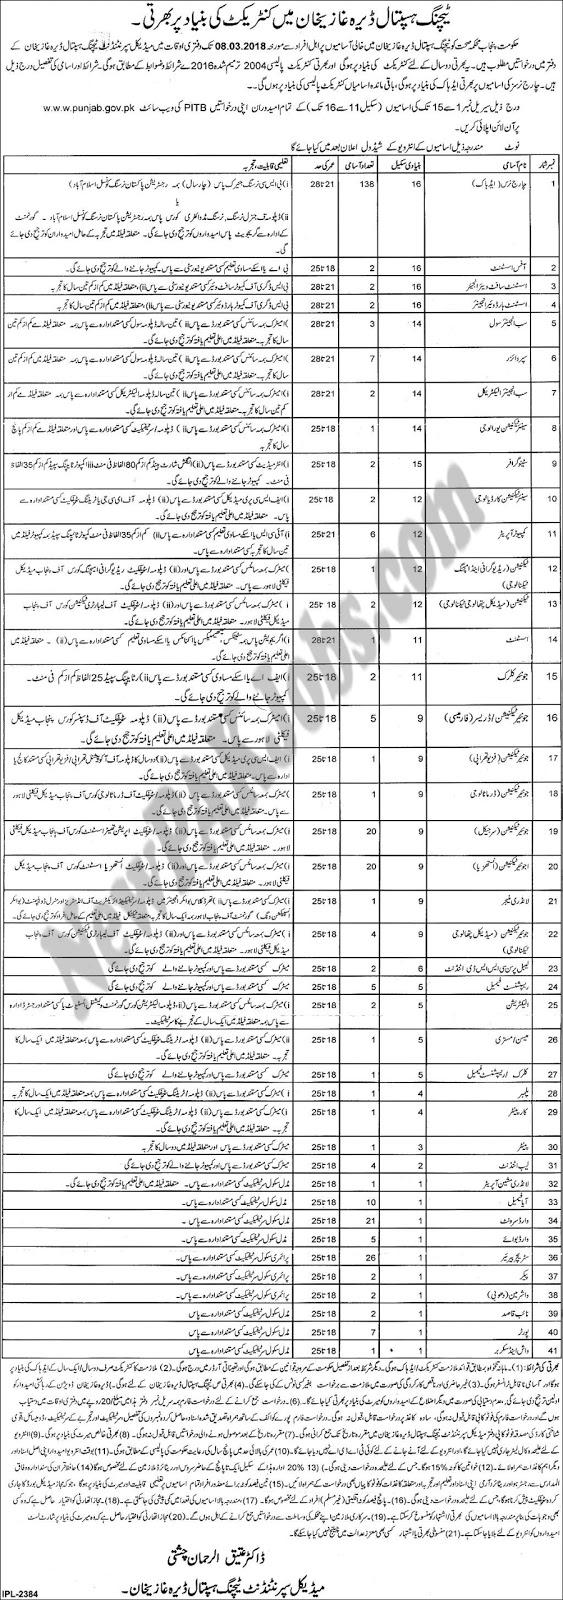 Govt Jobs 2018 in Teaching Hospital DG Khan (320+ Vacancies)